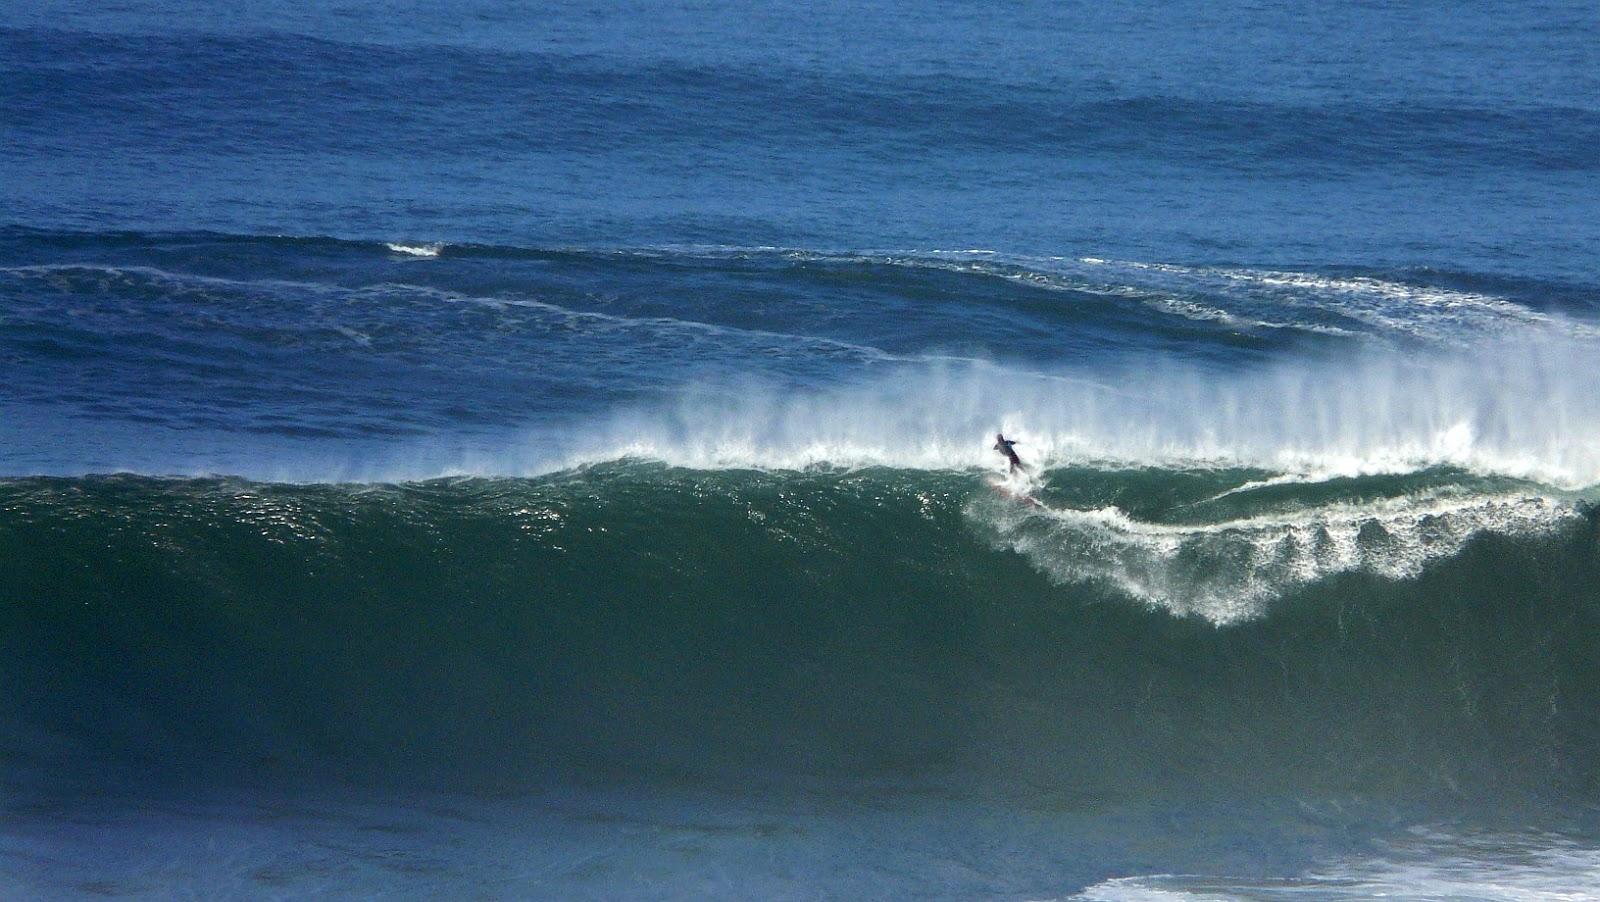 surf golf galea getxo bizkaia%2B%25287%2529